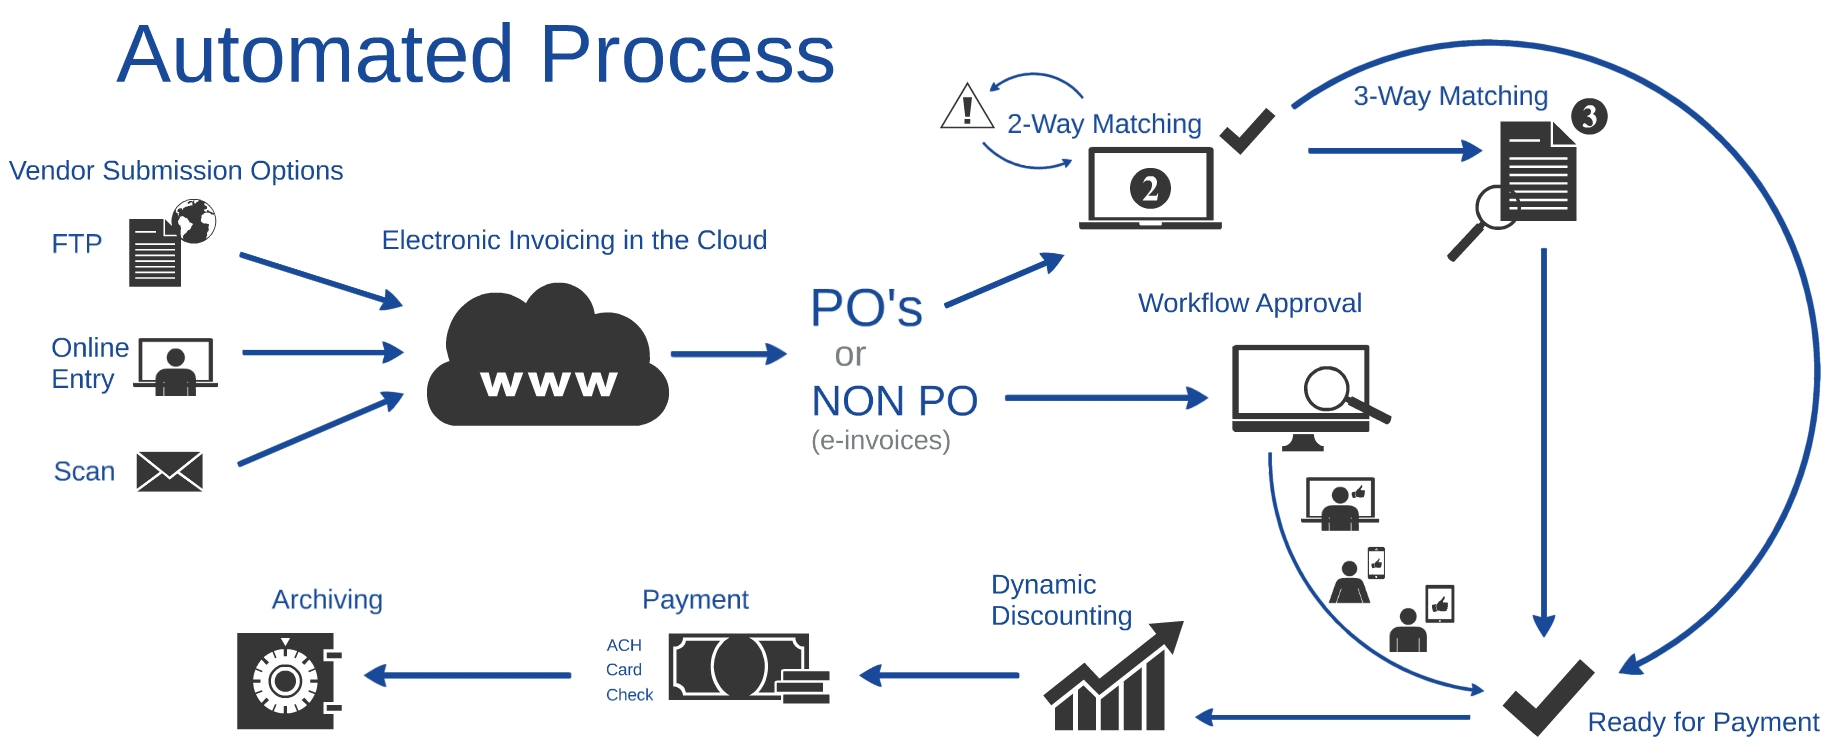 ap automation ipayables accounts payable automation electronic invoice reconciliation process